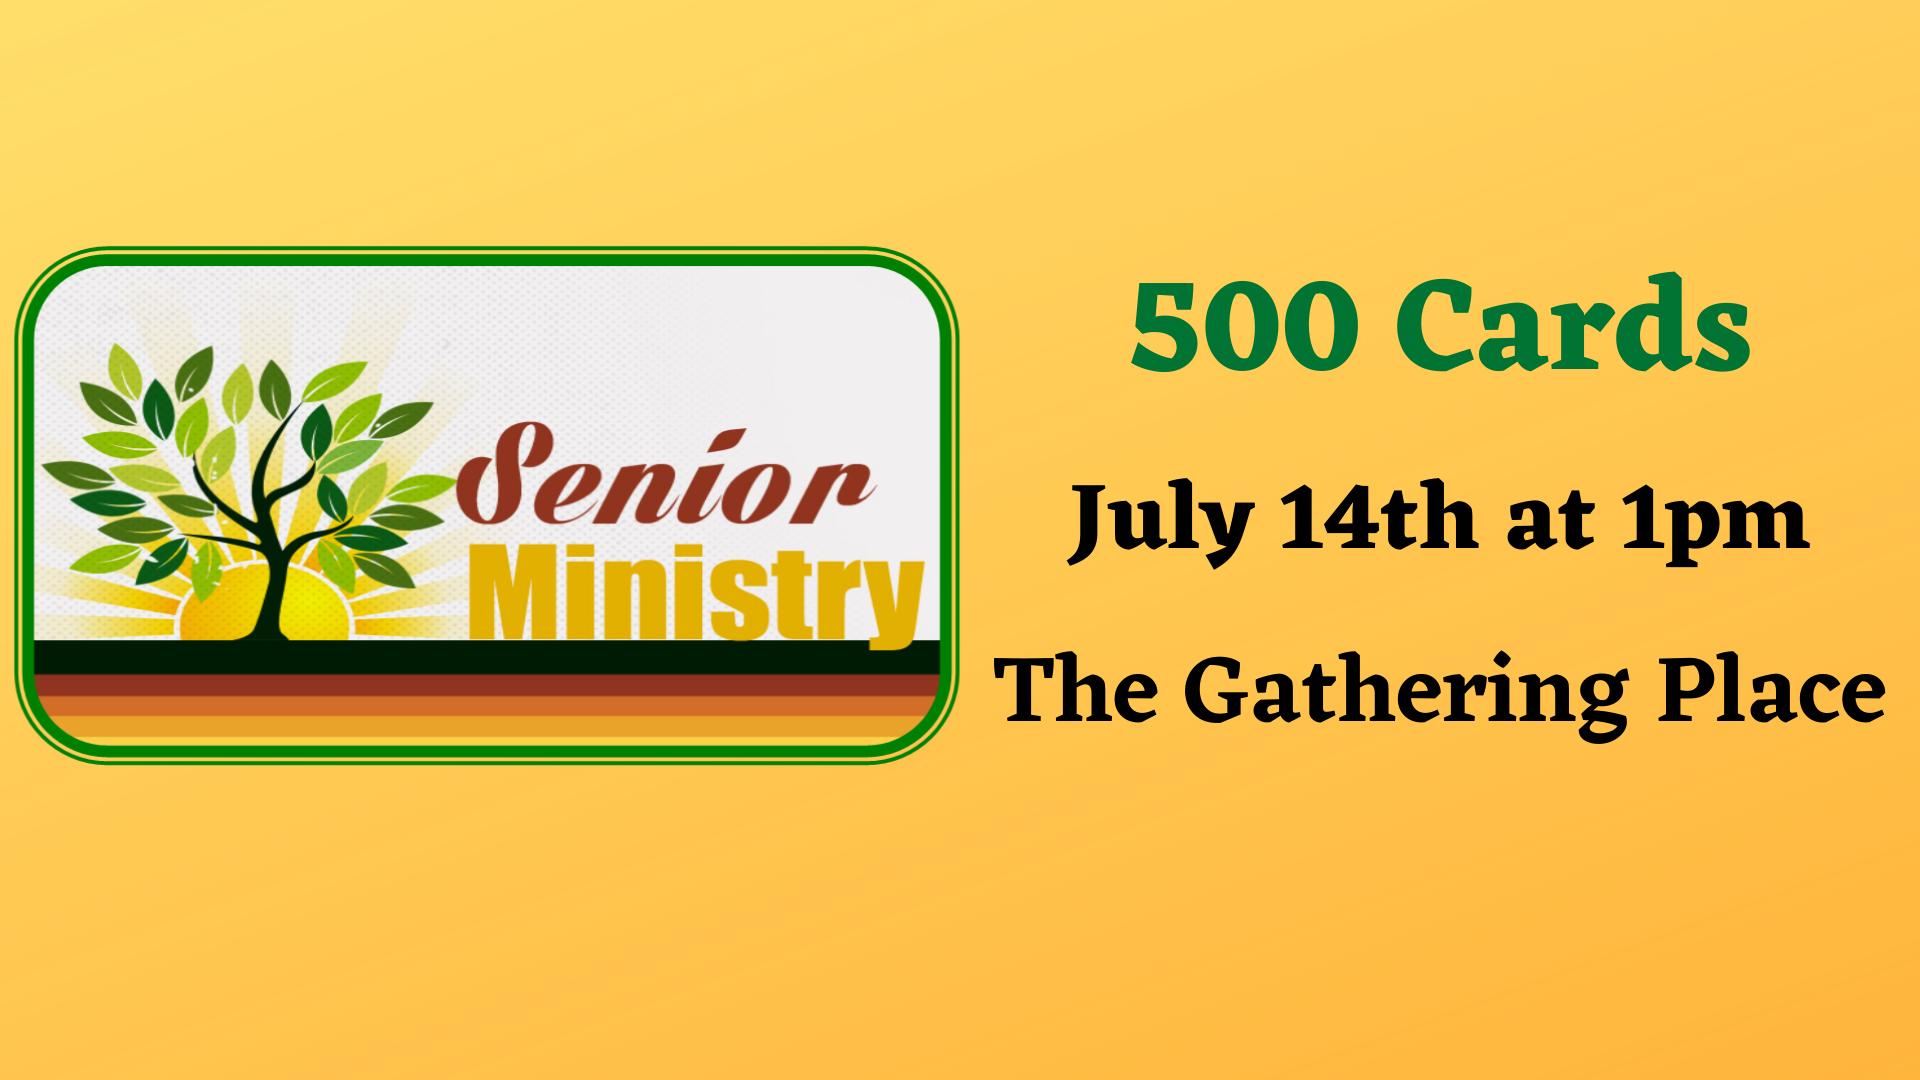 Senior Ministry - 500 Cards